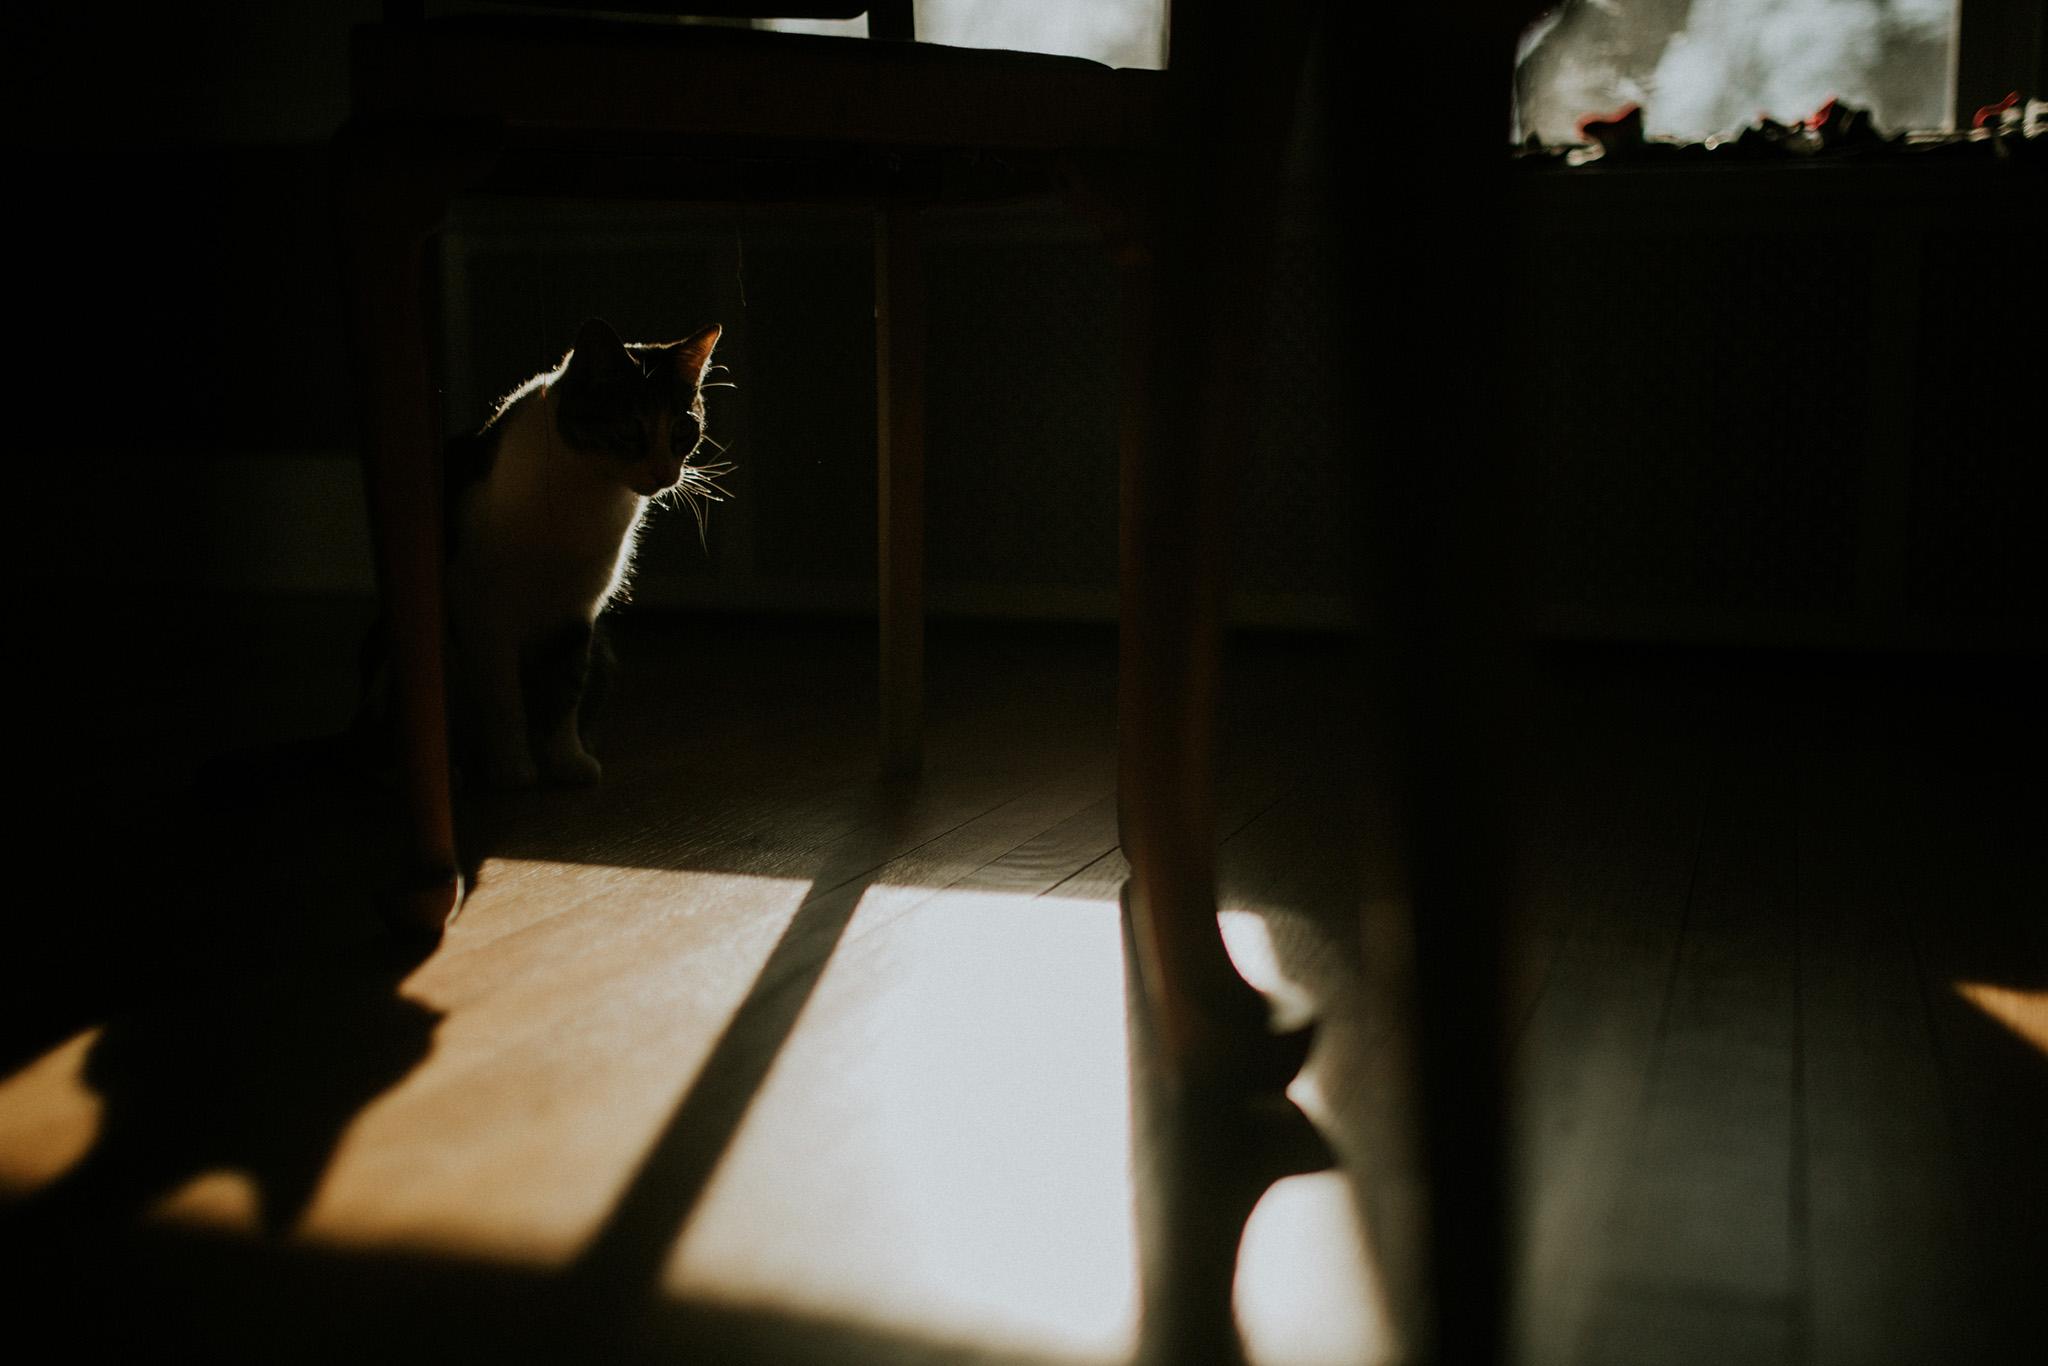 January 27: Caturday shadow play.